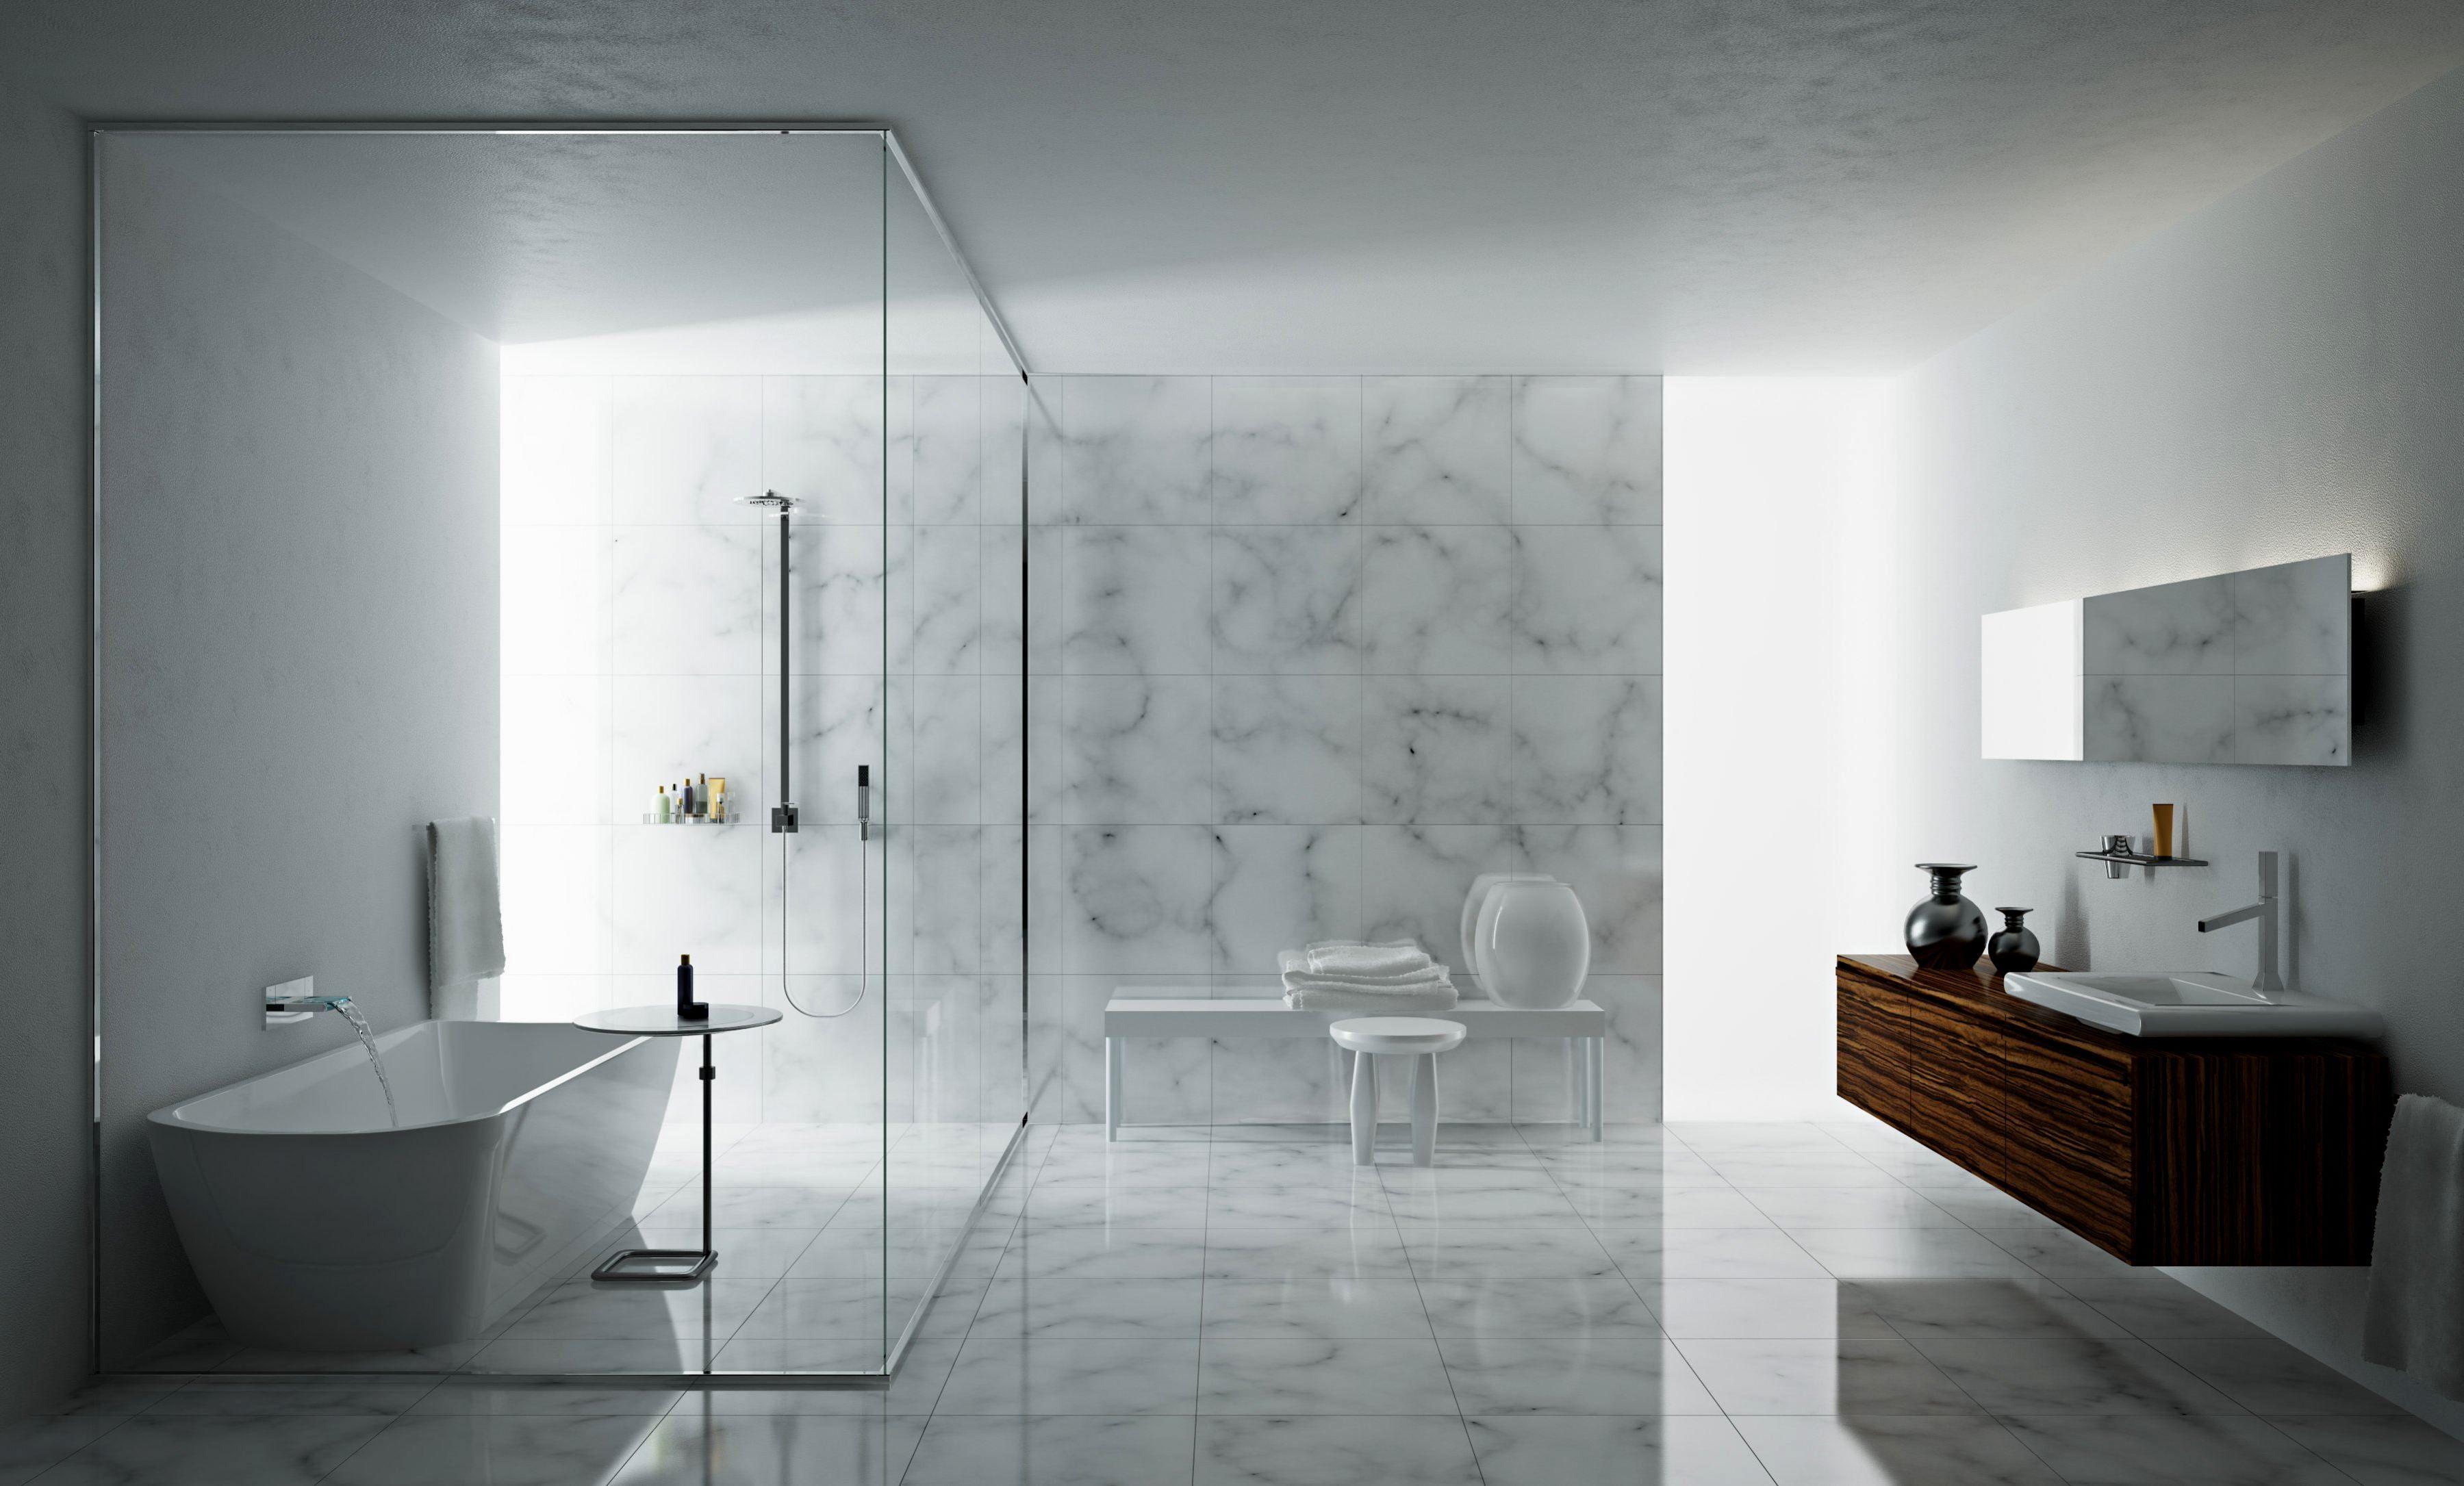 inspirational italian bathroom vanities image-Fascinating Italian Bathroom Vanities Design